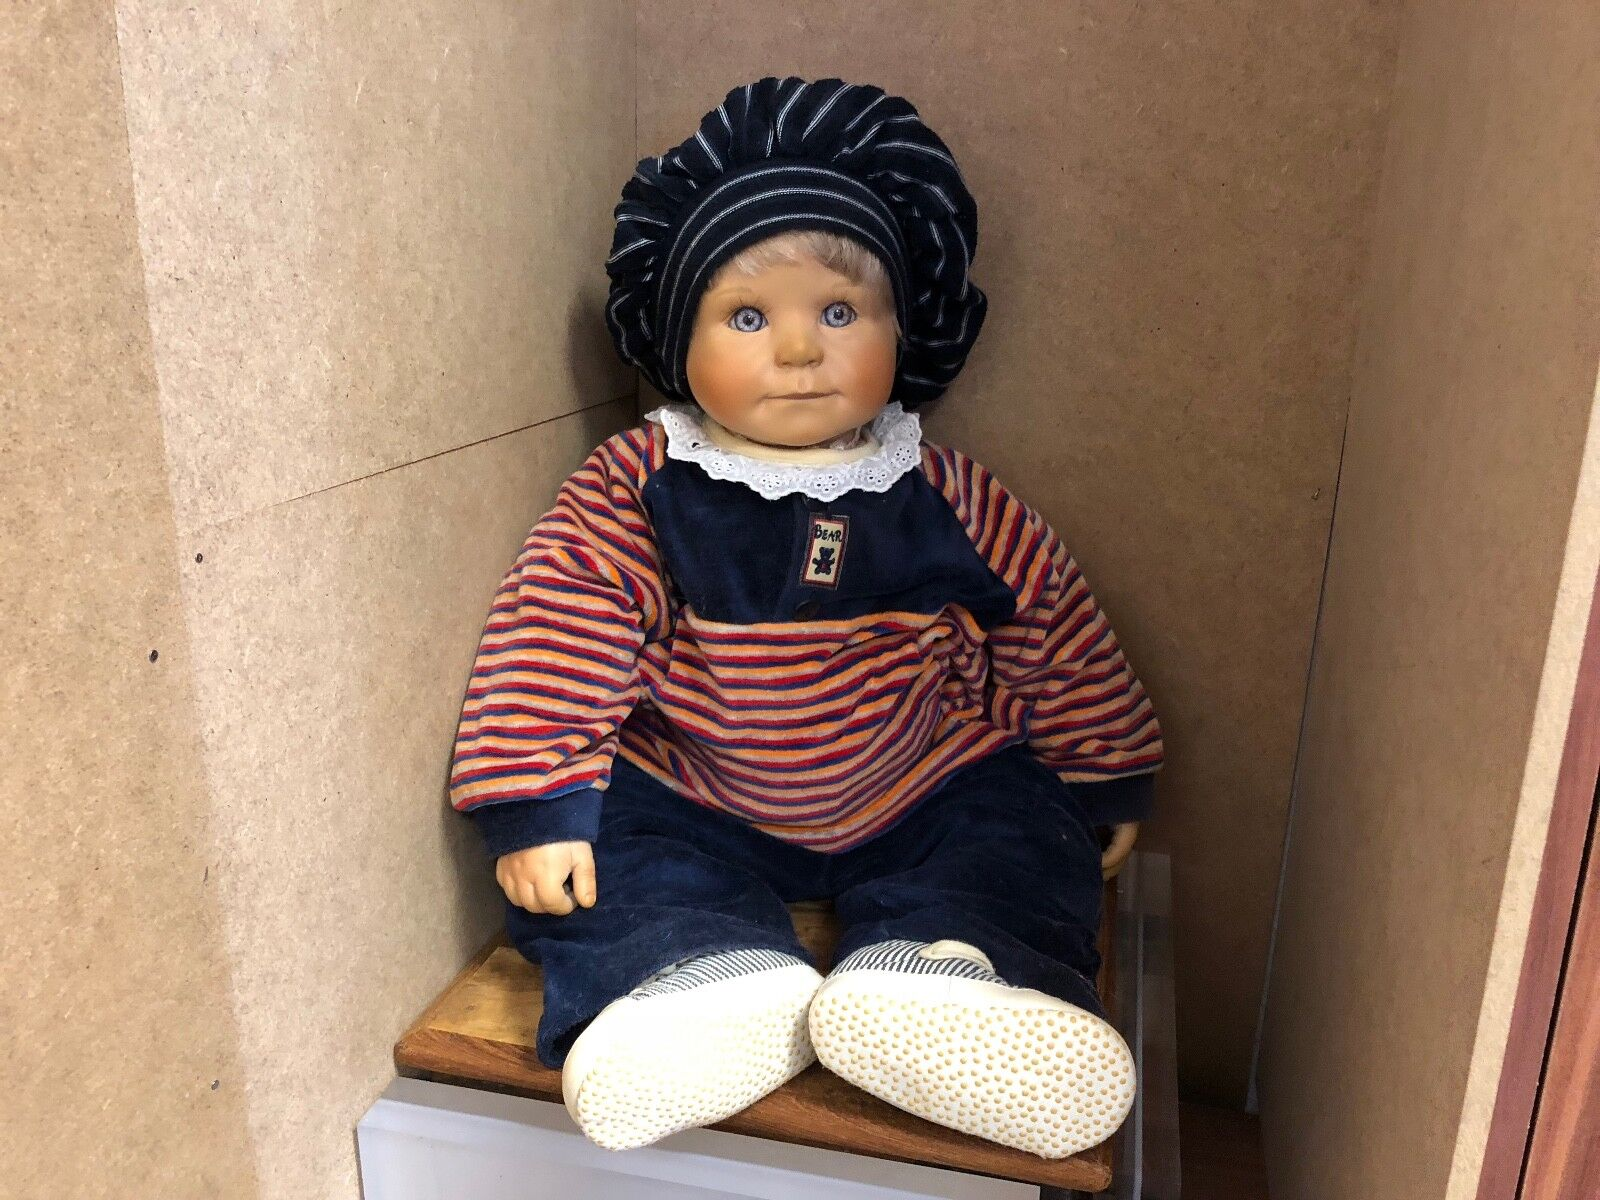 Yolanda Bello Vinyl Puppe 62 cm. Top Zustand